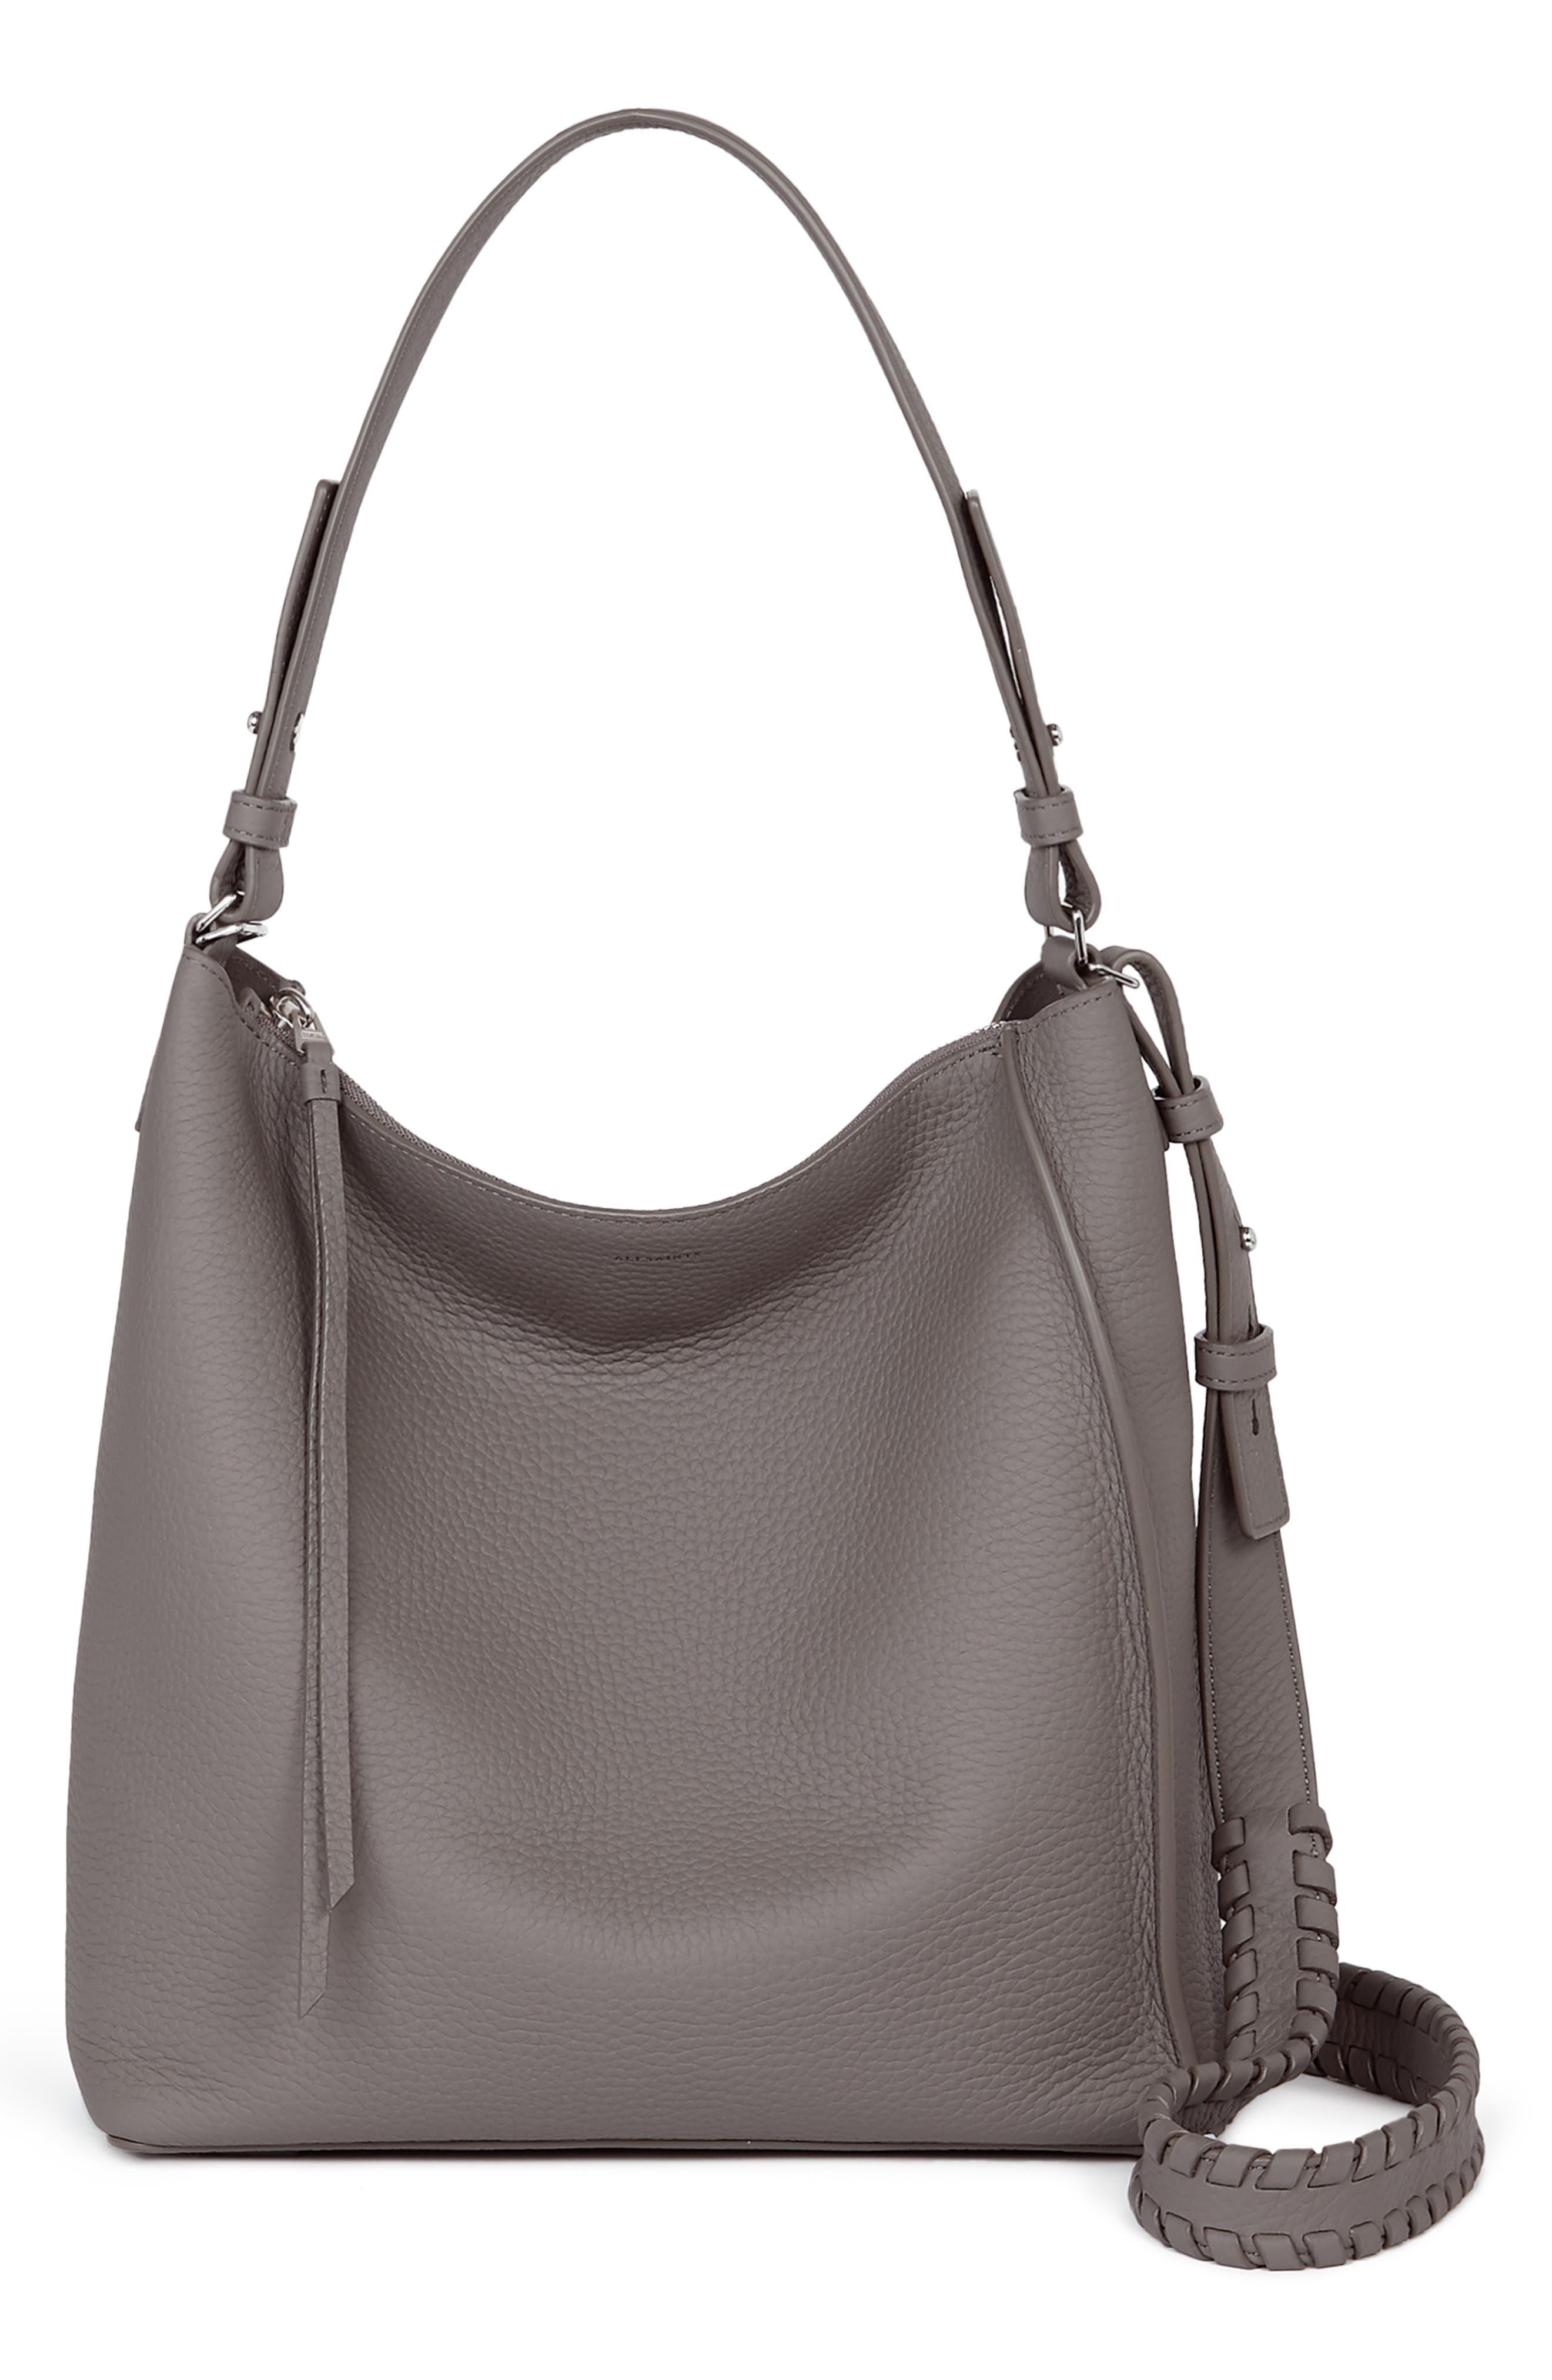 ALLSAINTS 'Kita' Leather Shoulder/Crossbody Bag - Grey in Storm Grey